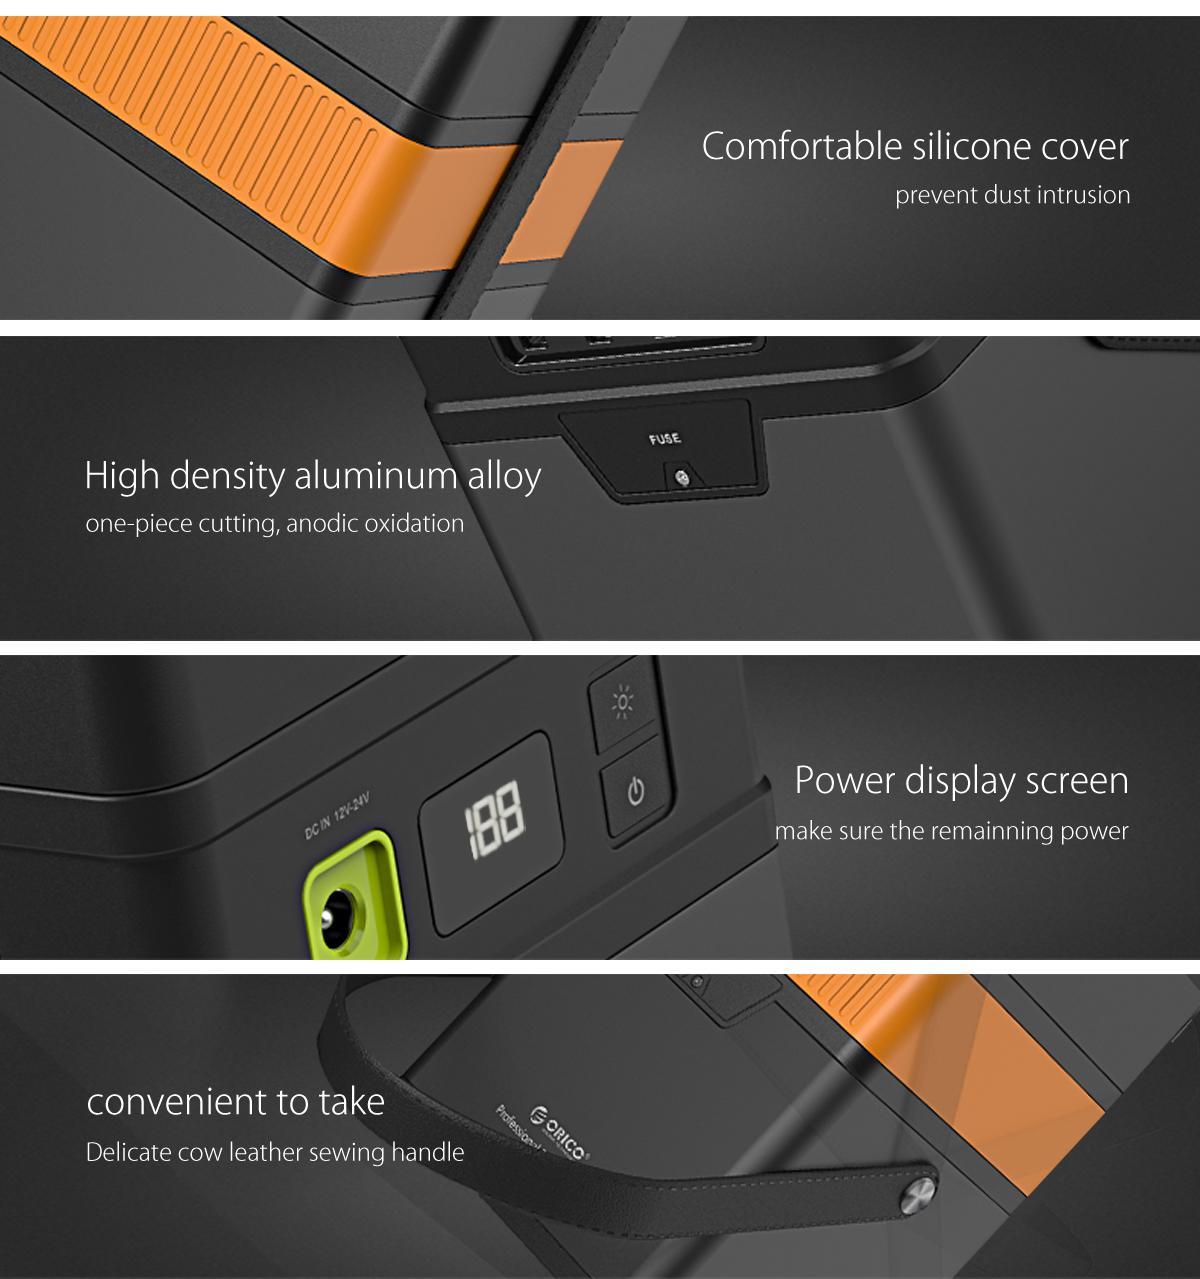 ORICO 100W 50,000mAh : 3 Charging System (AC 220V, DC, QC2.0) Powerbank ชาร์จไฟได้3ระบบ AC 220V, DC, USB QC2.0 พาวเวอร์แบงค์ขนาด 50000 mAh